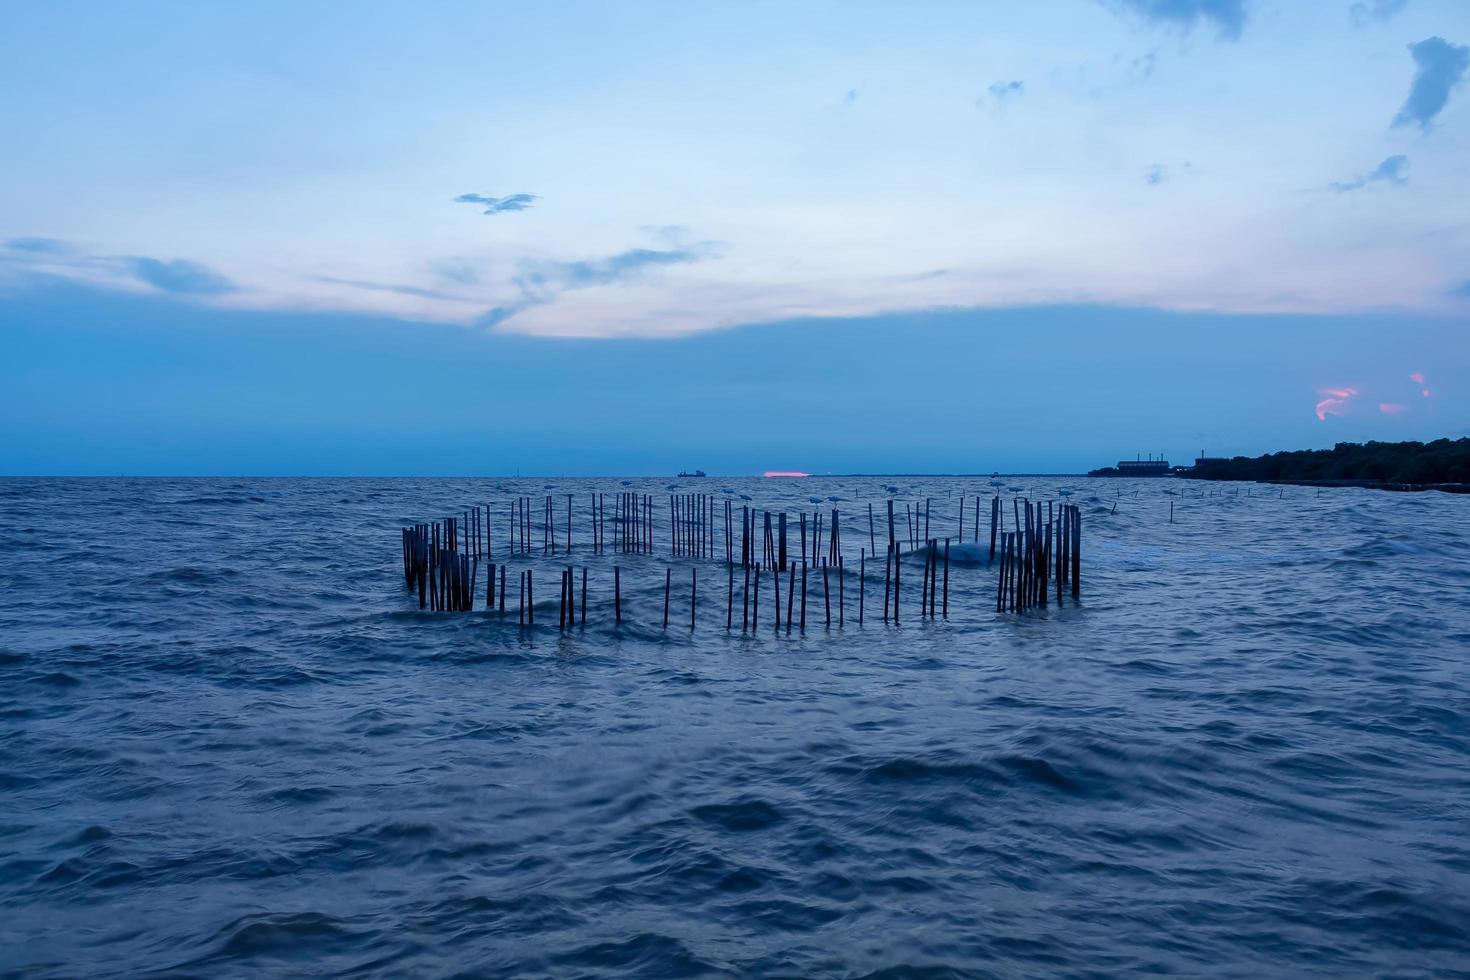 herzförmiger Bambus im Meer in Samut Prakan, Thailand foto